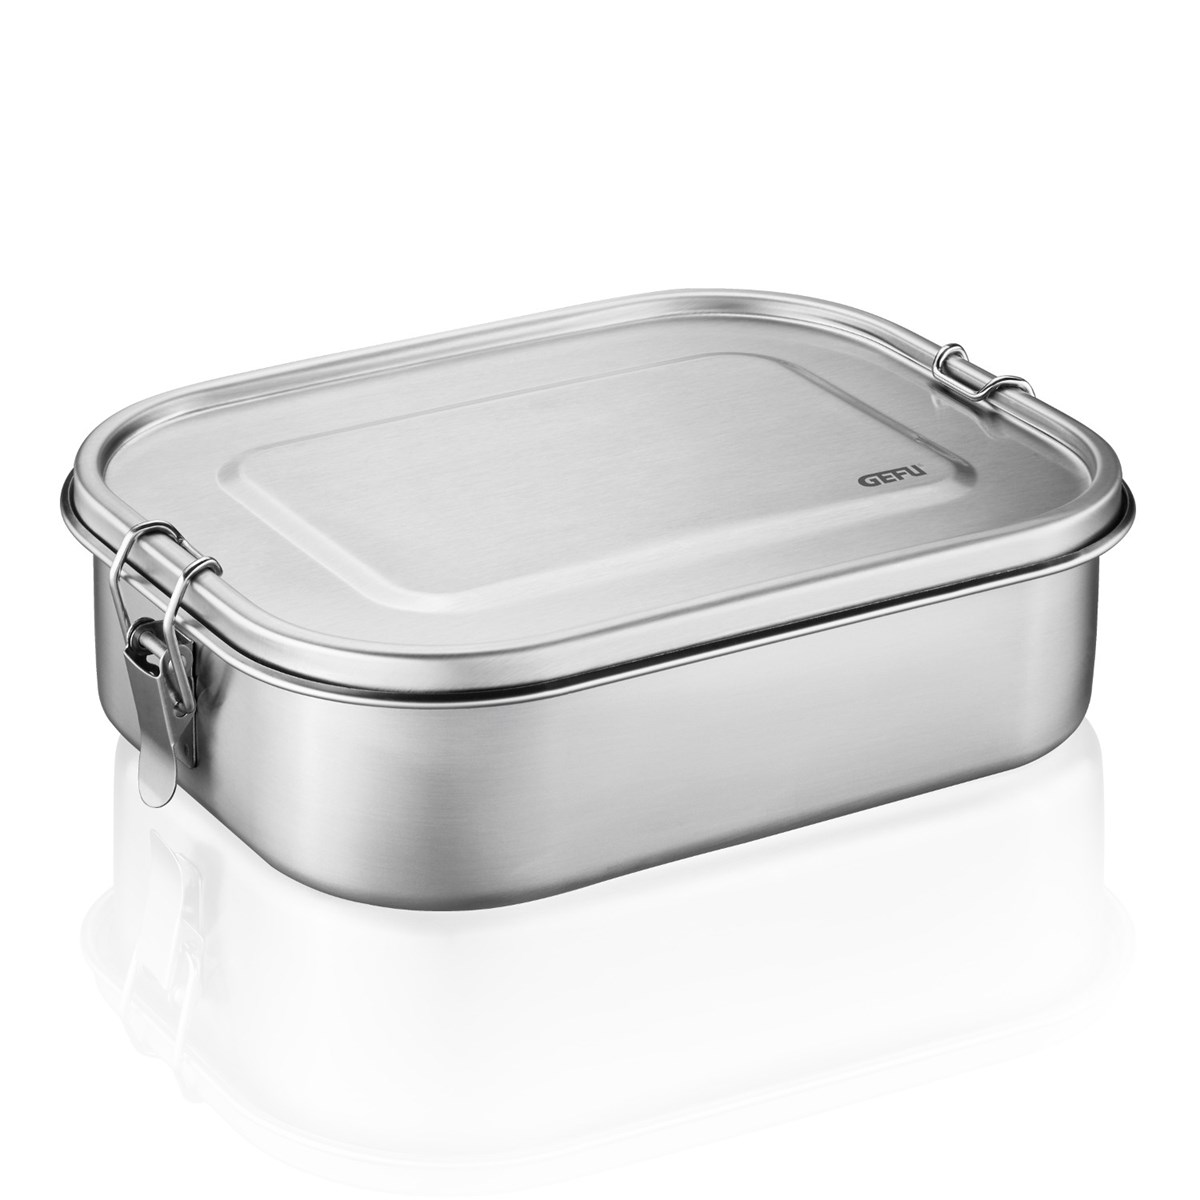 Lunch box grande en acier inoxydable argent